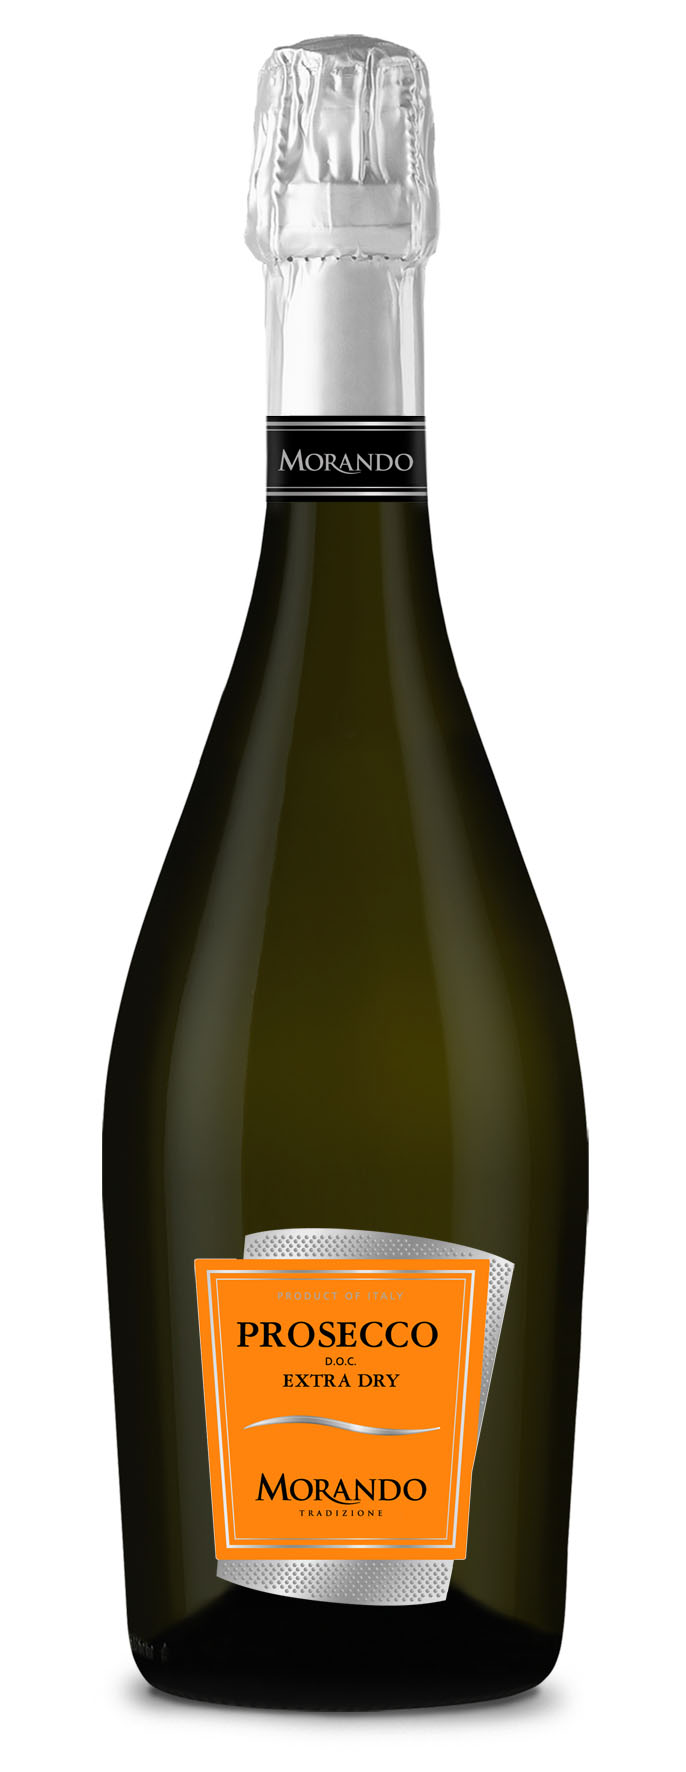 Vin spumant - Morando prosecco,extra dry, demisec, alb